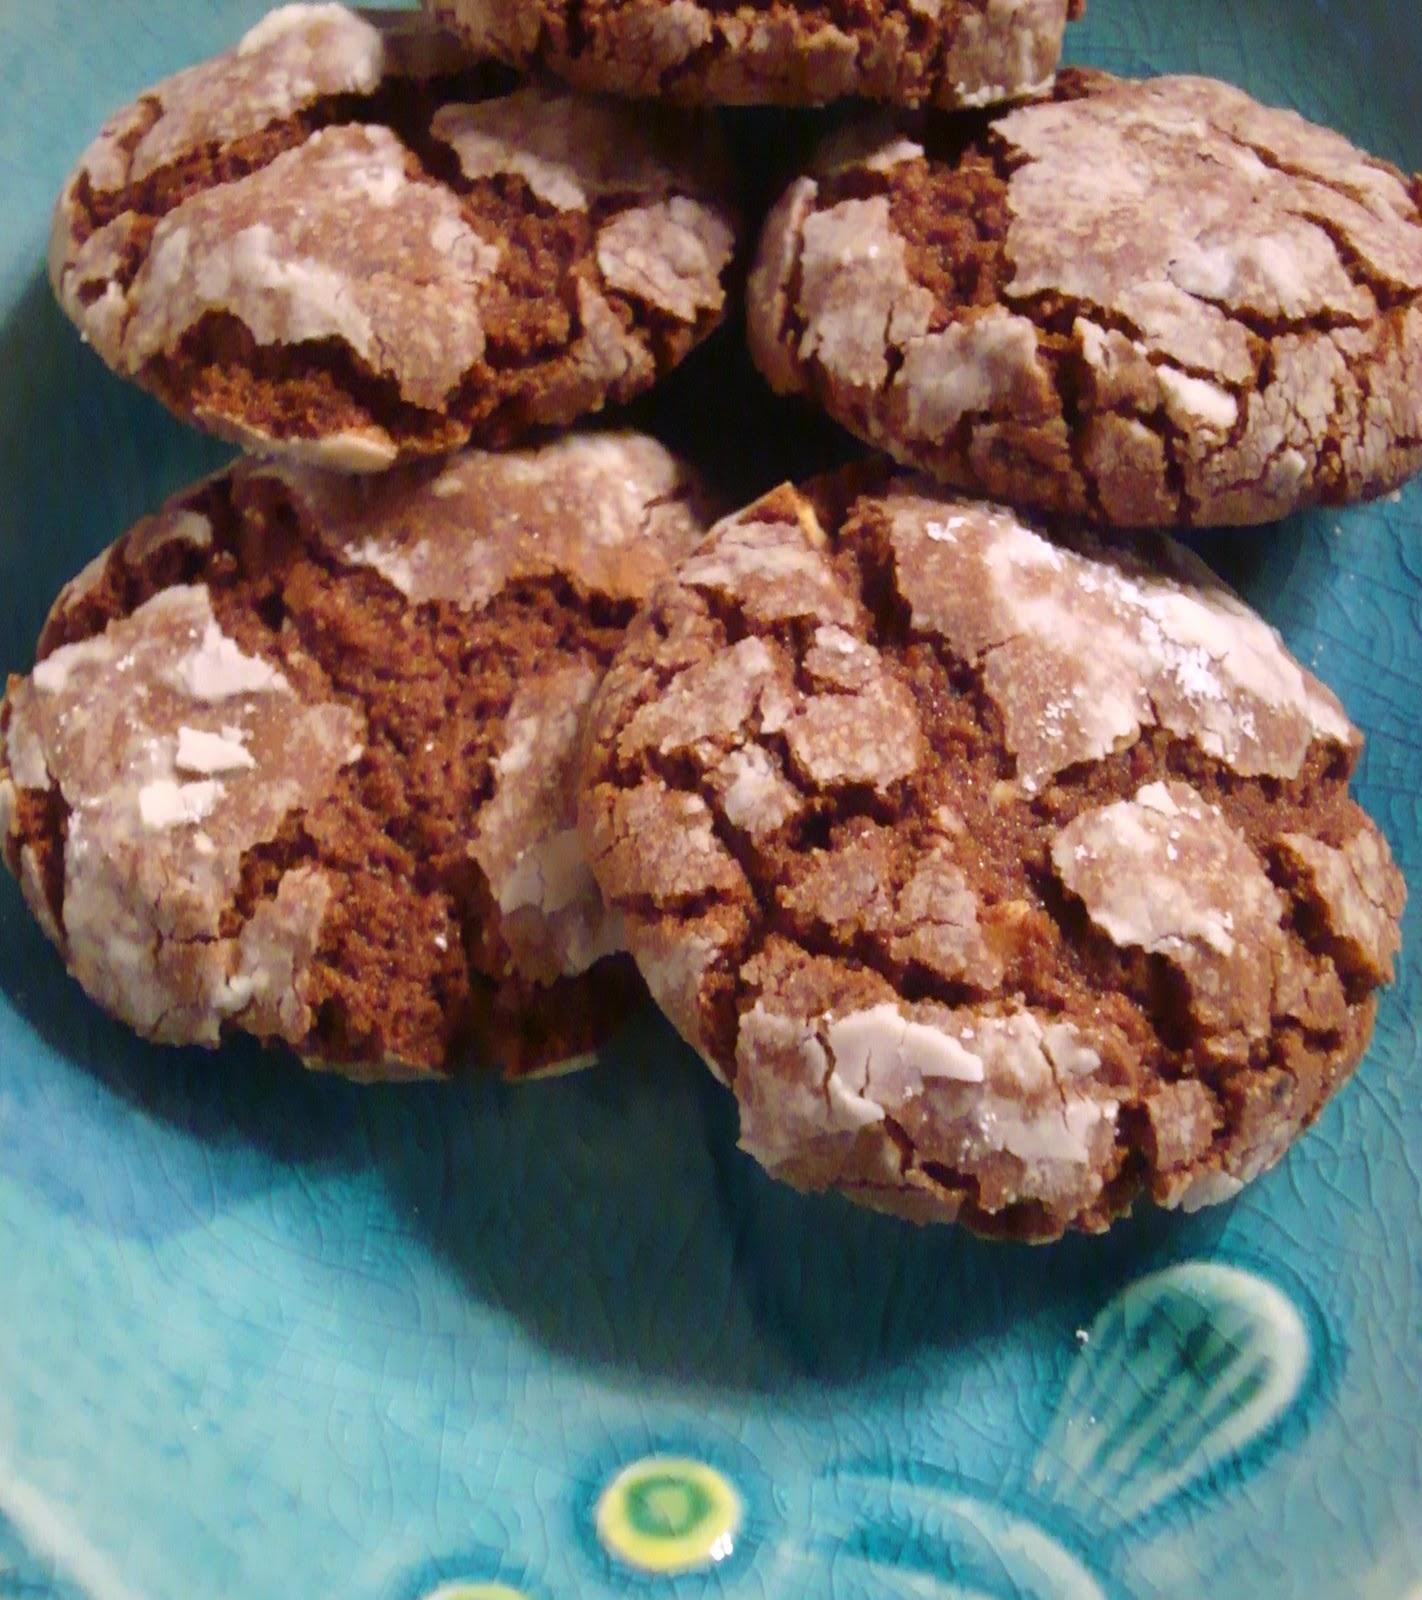 astheroshe 39 s hazelnut nutella crinkle cookies world. Black Bedroom Furniture Sets. Home Design Ideas